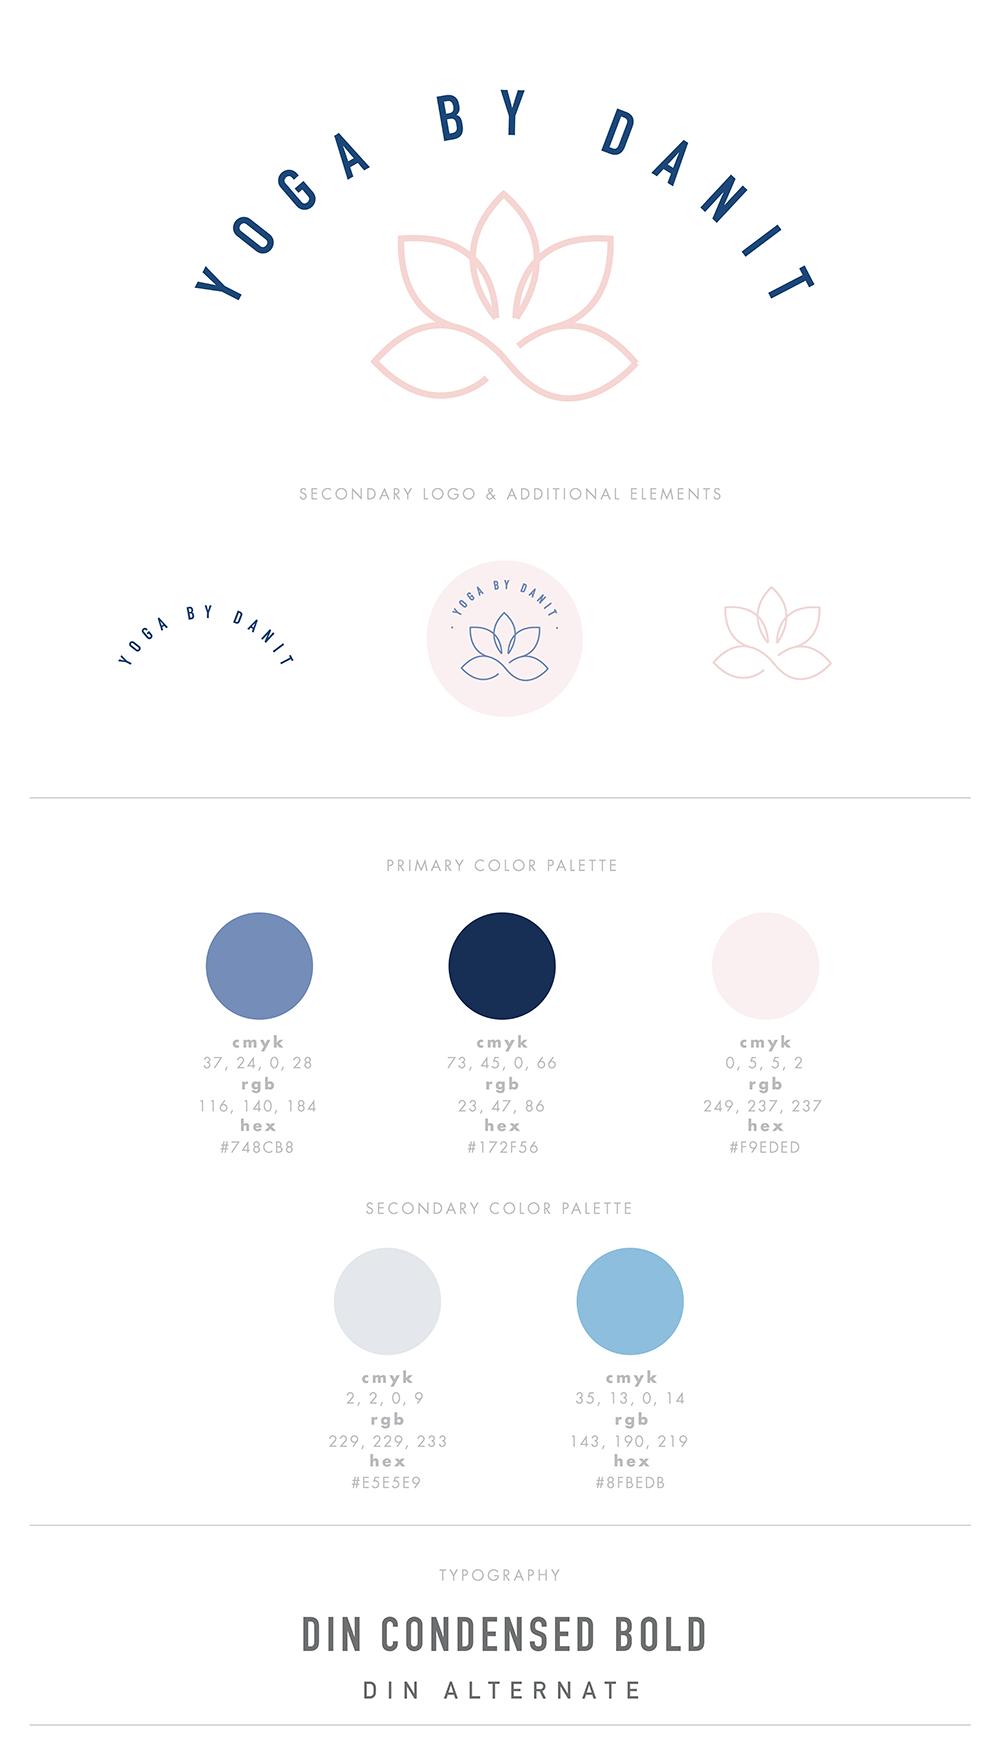 danit-yoga-web-design-logo-branding.pong